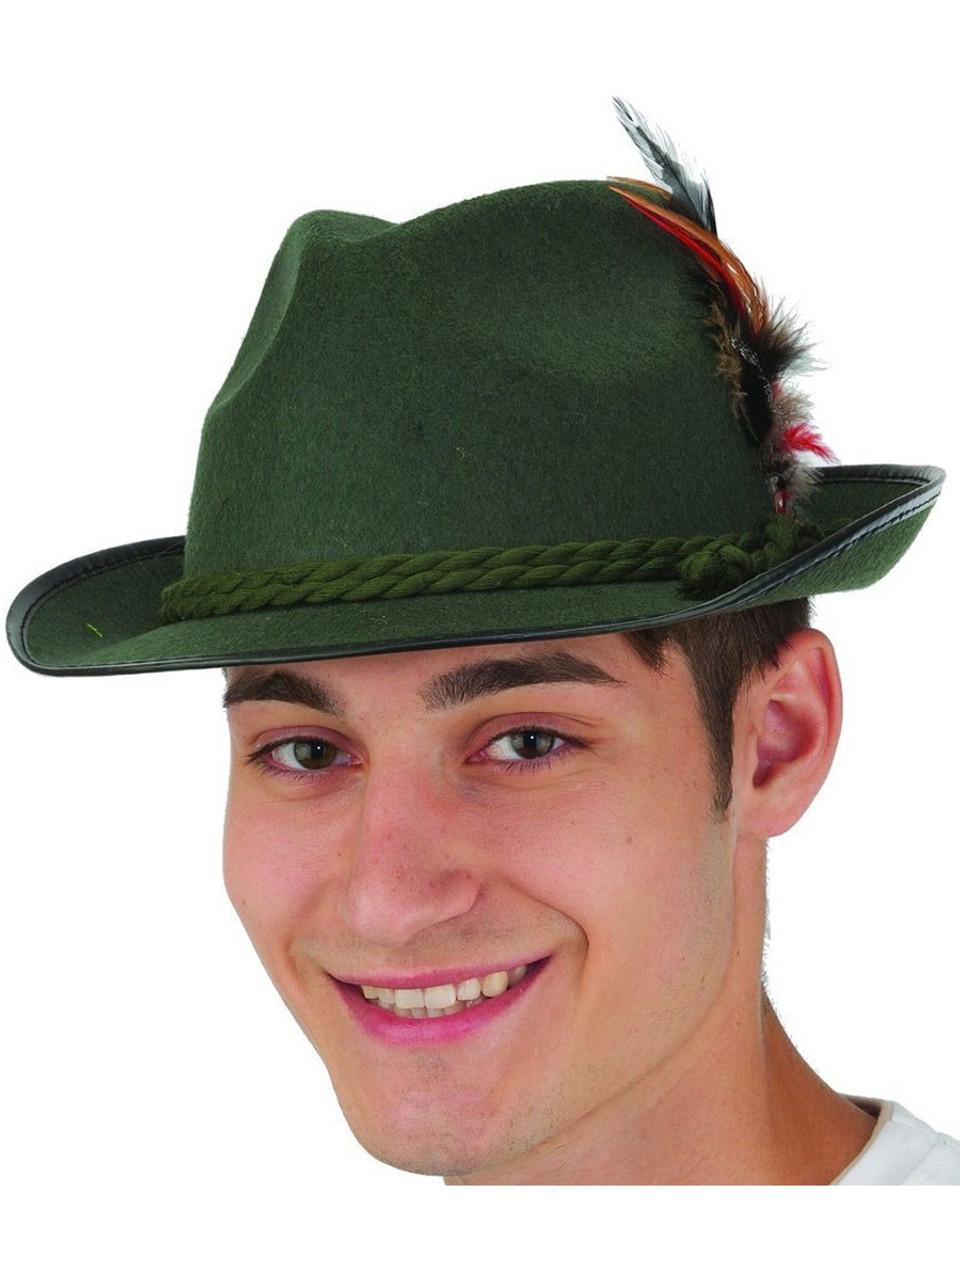 853a0558ab8ebe Adults Mens Green Felt Bavarian Hat Costume Accessory